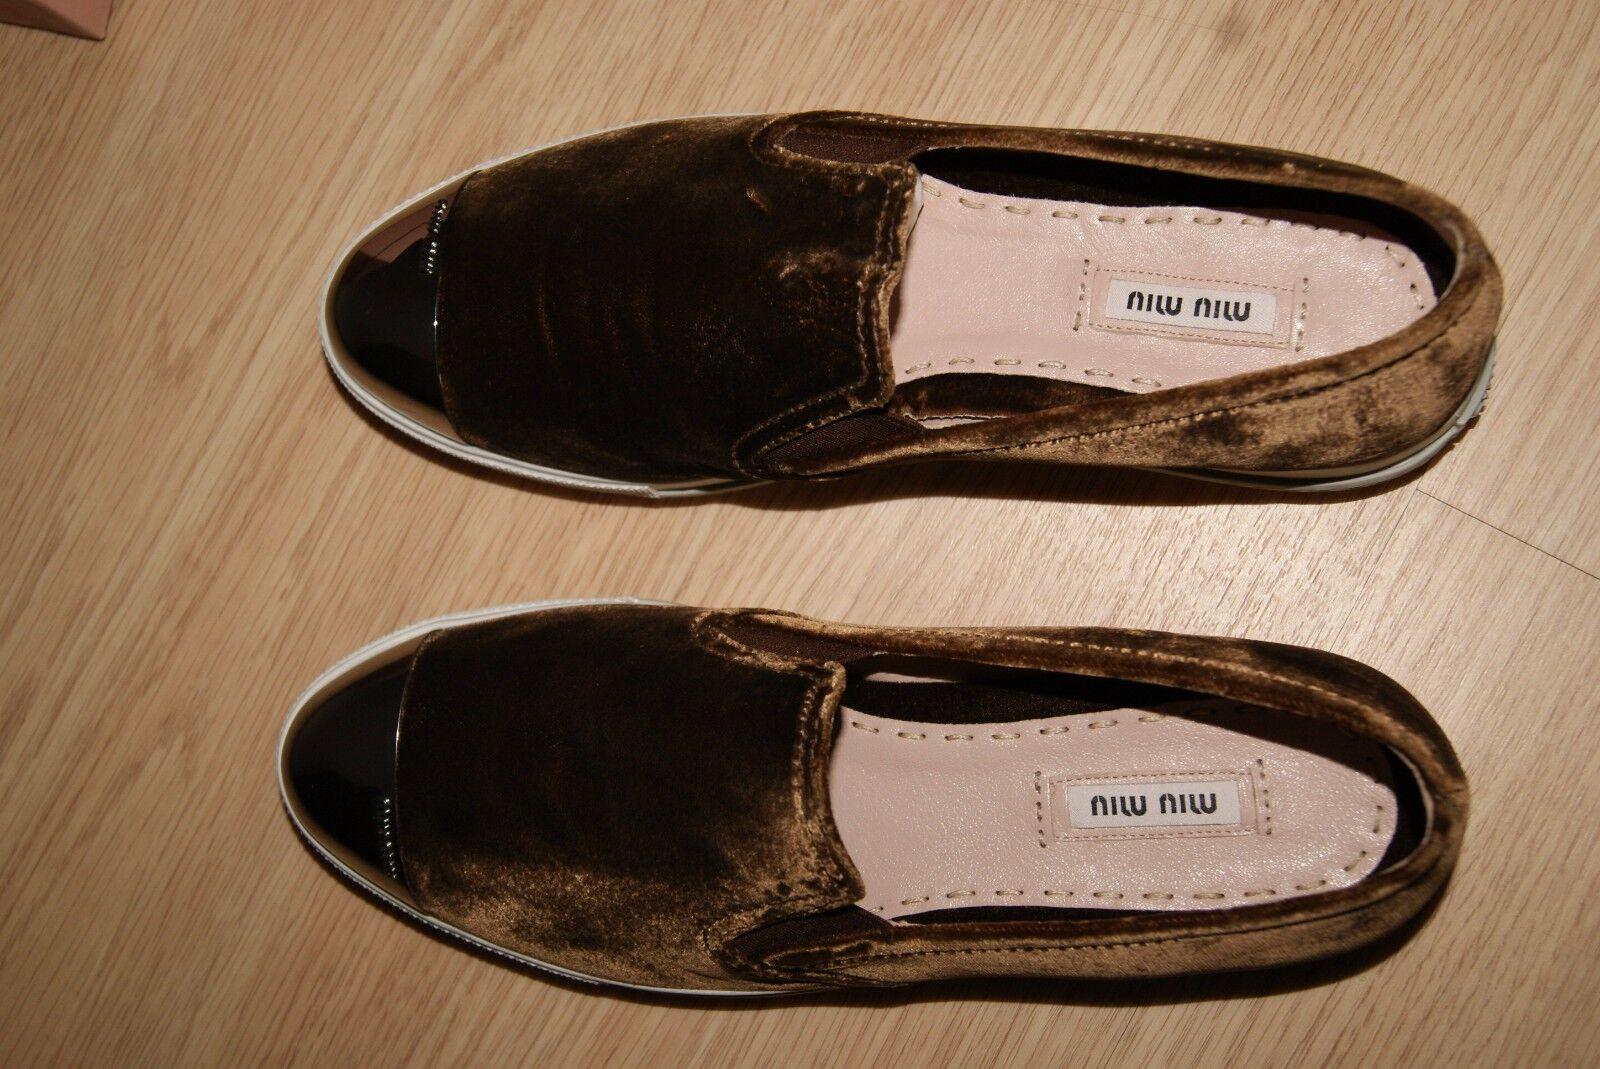 MIU MIU by PRADA Sneakers Gr. 39 39 39 Pumps braun NEU dfbabb